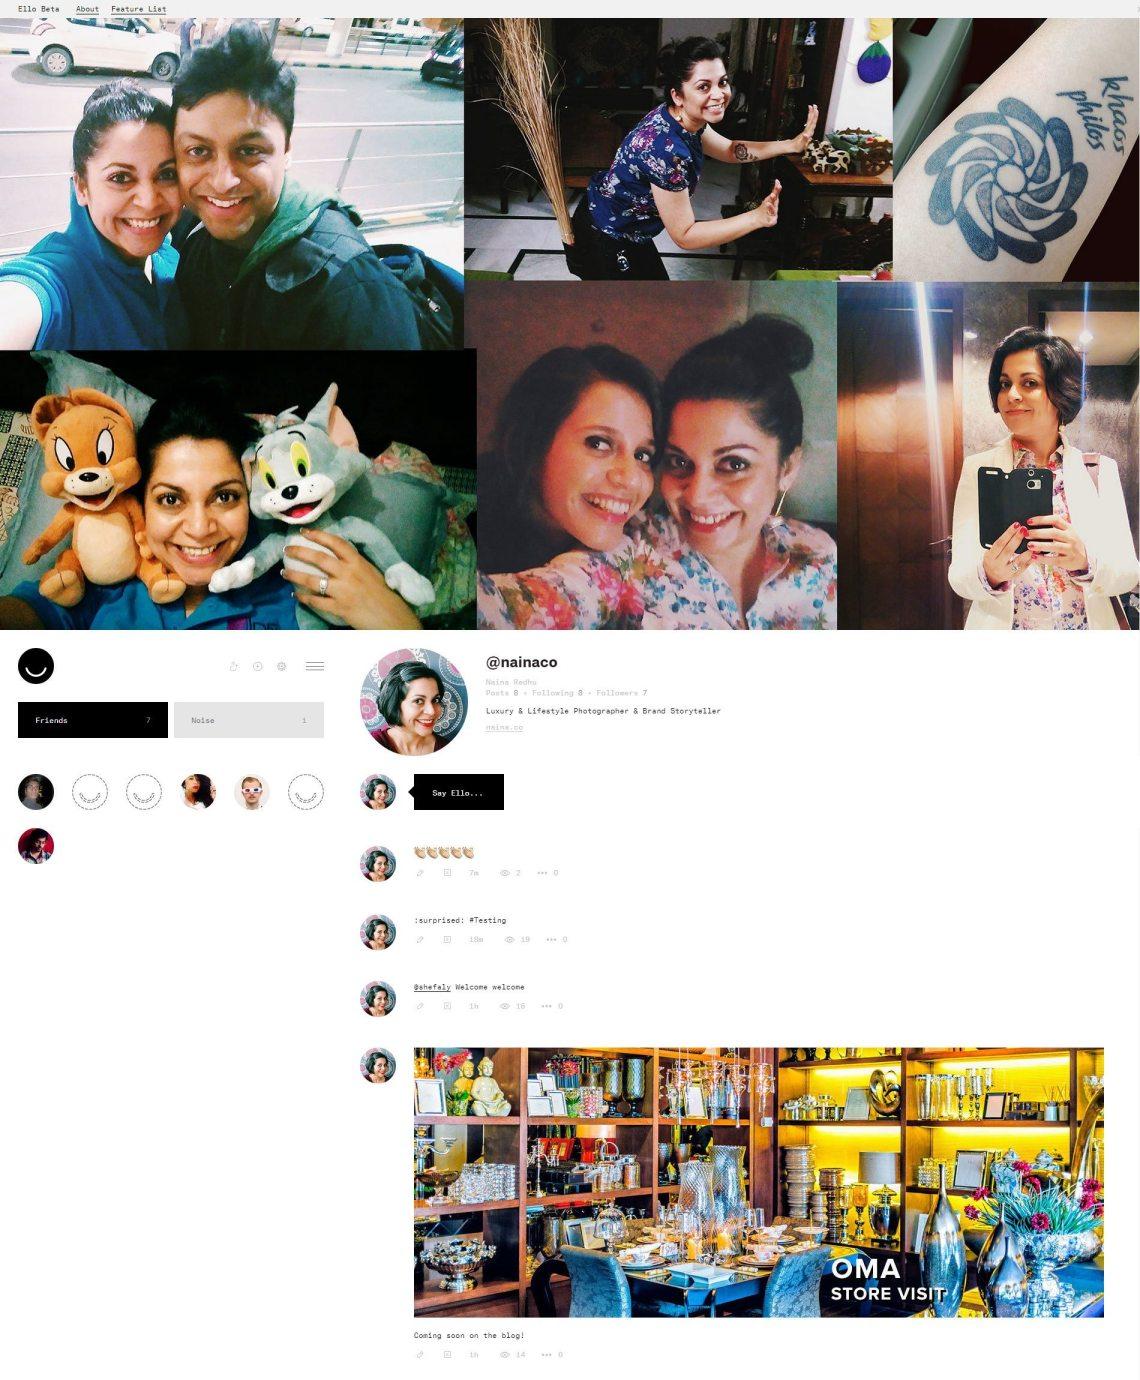 NainaCo-Photographer-Storyteller-Luxury-Lifestyle-Raconteuse-Ello-Social-Network-Profile-NainaCo